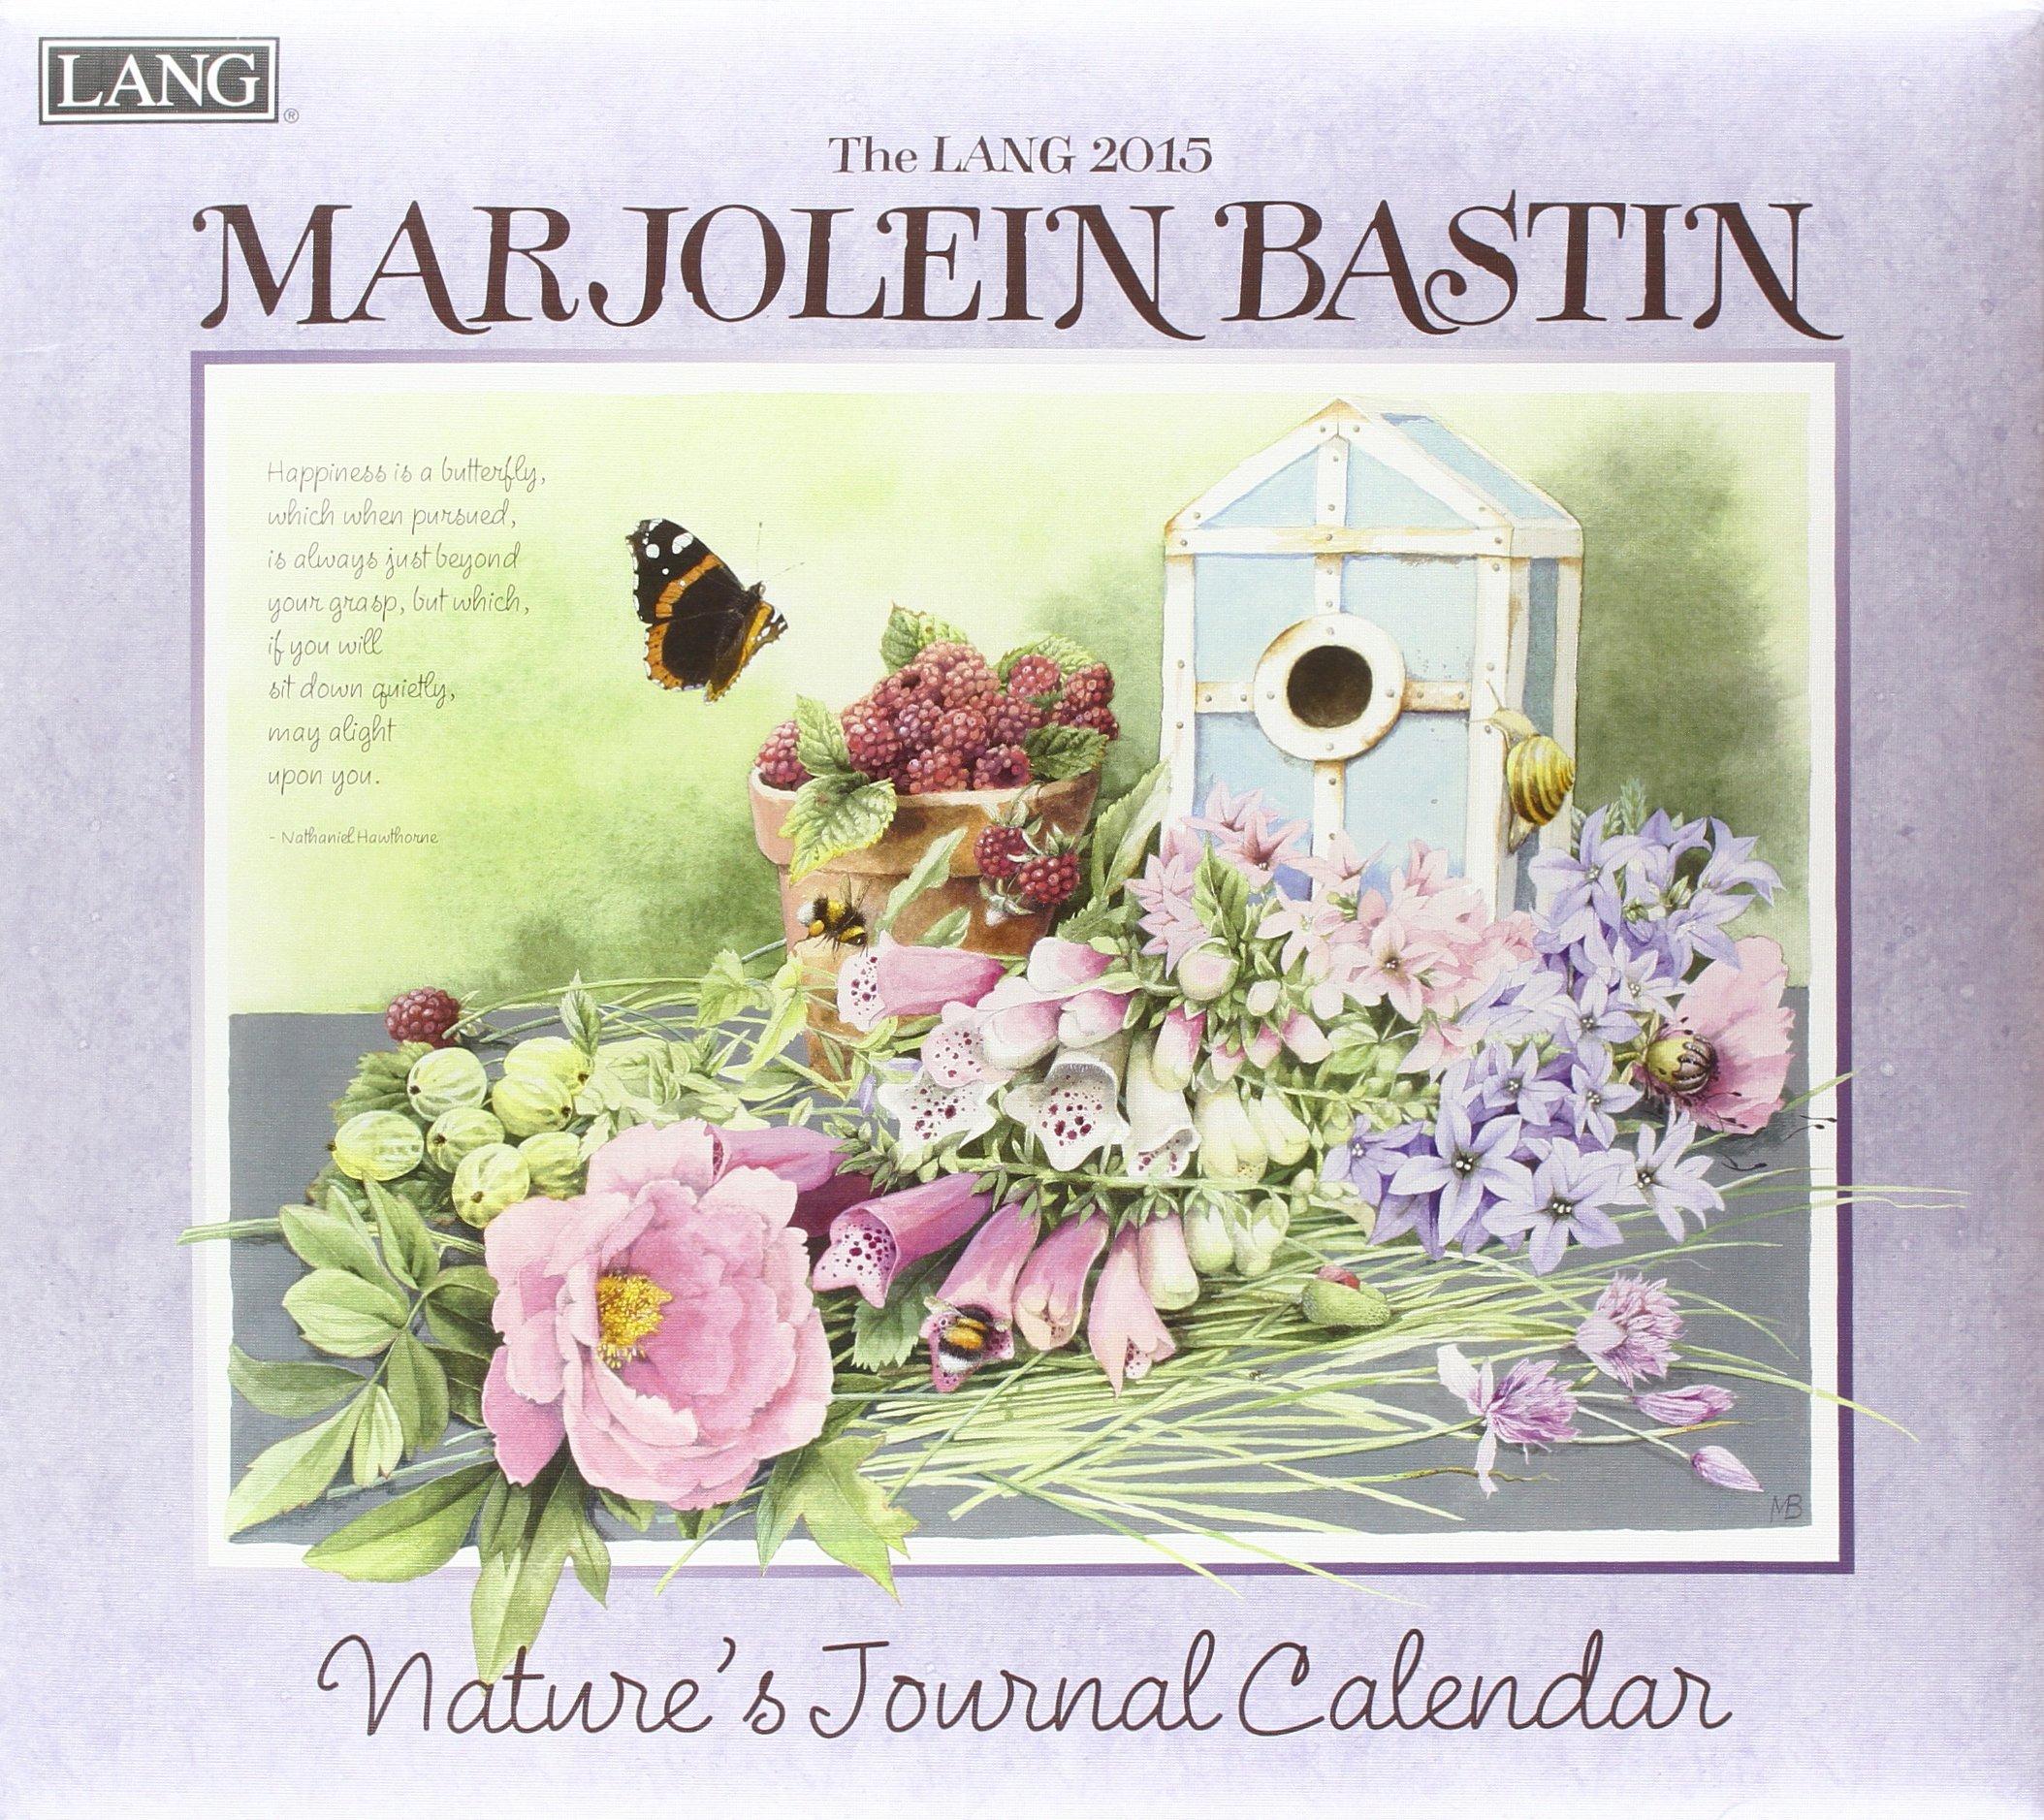 The lang marjolein bastin natures journal calendar marjolein the lang marjolein bastin natures journal calendar marjolein bastin 9780741246998 amazon books m4hsunfo